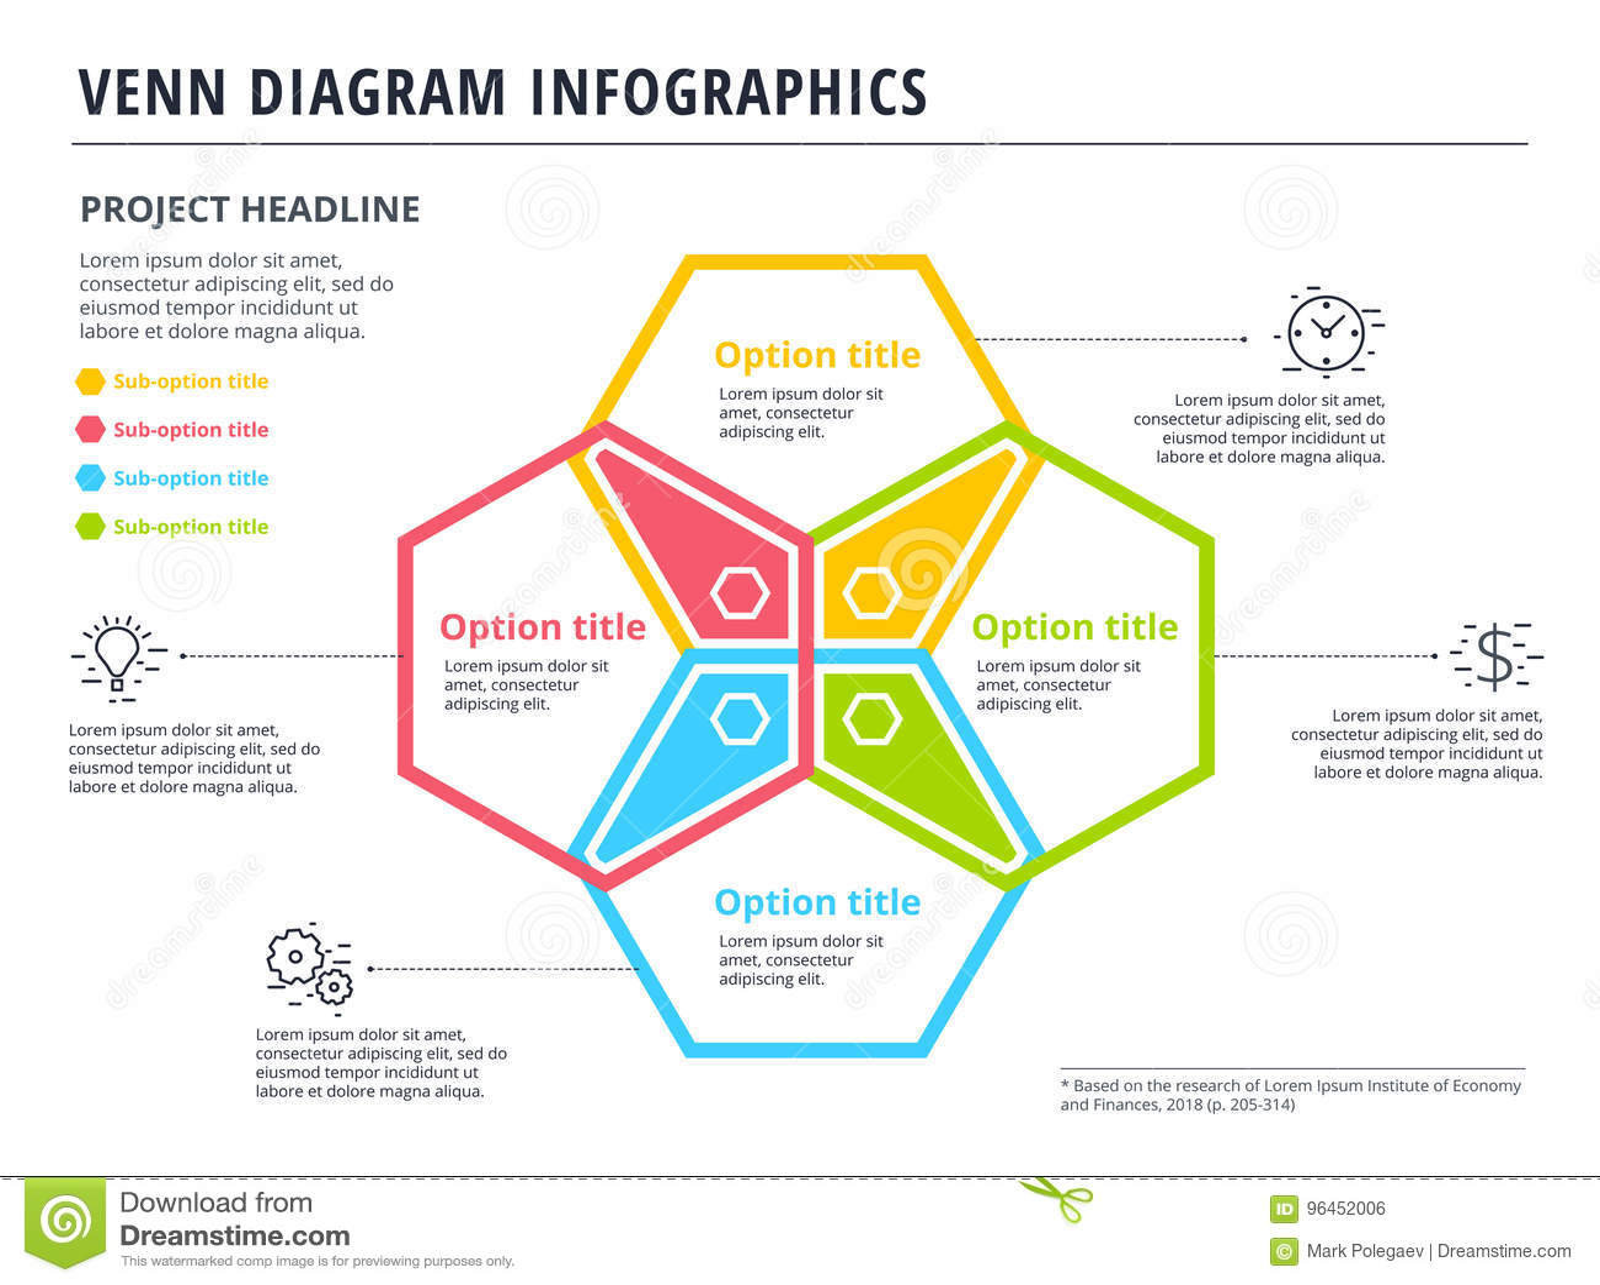 Venn Diagram With 4 Circles Infographics Template Design